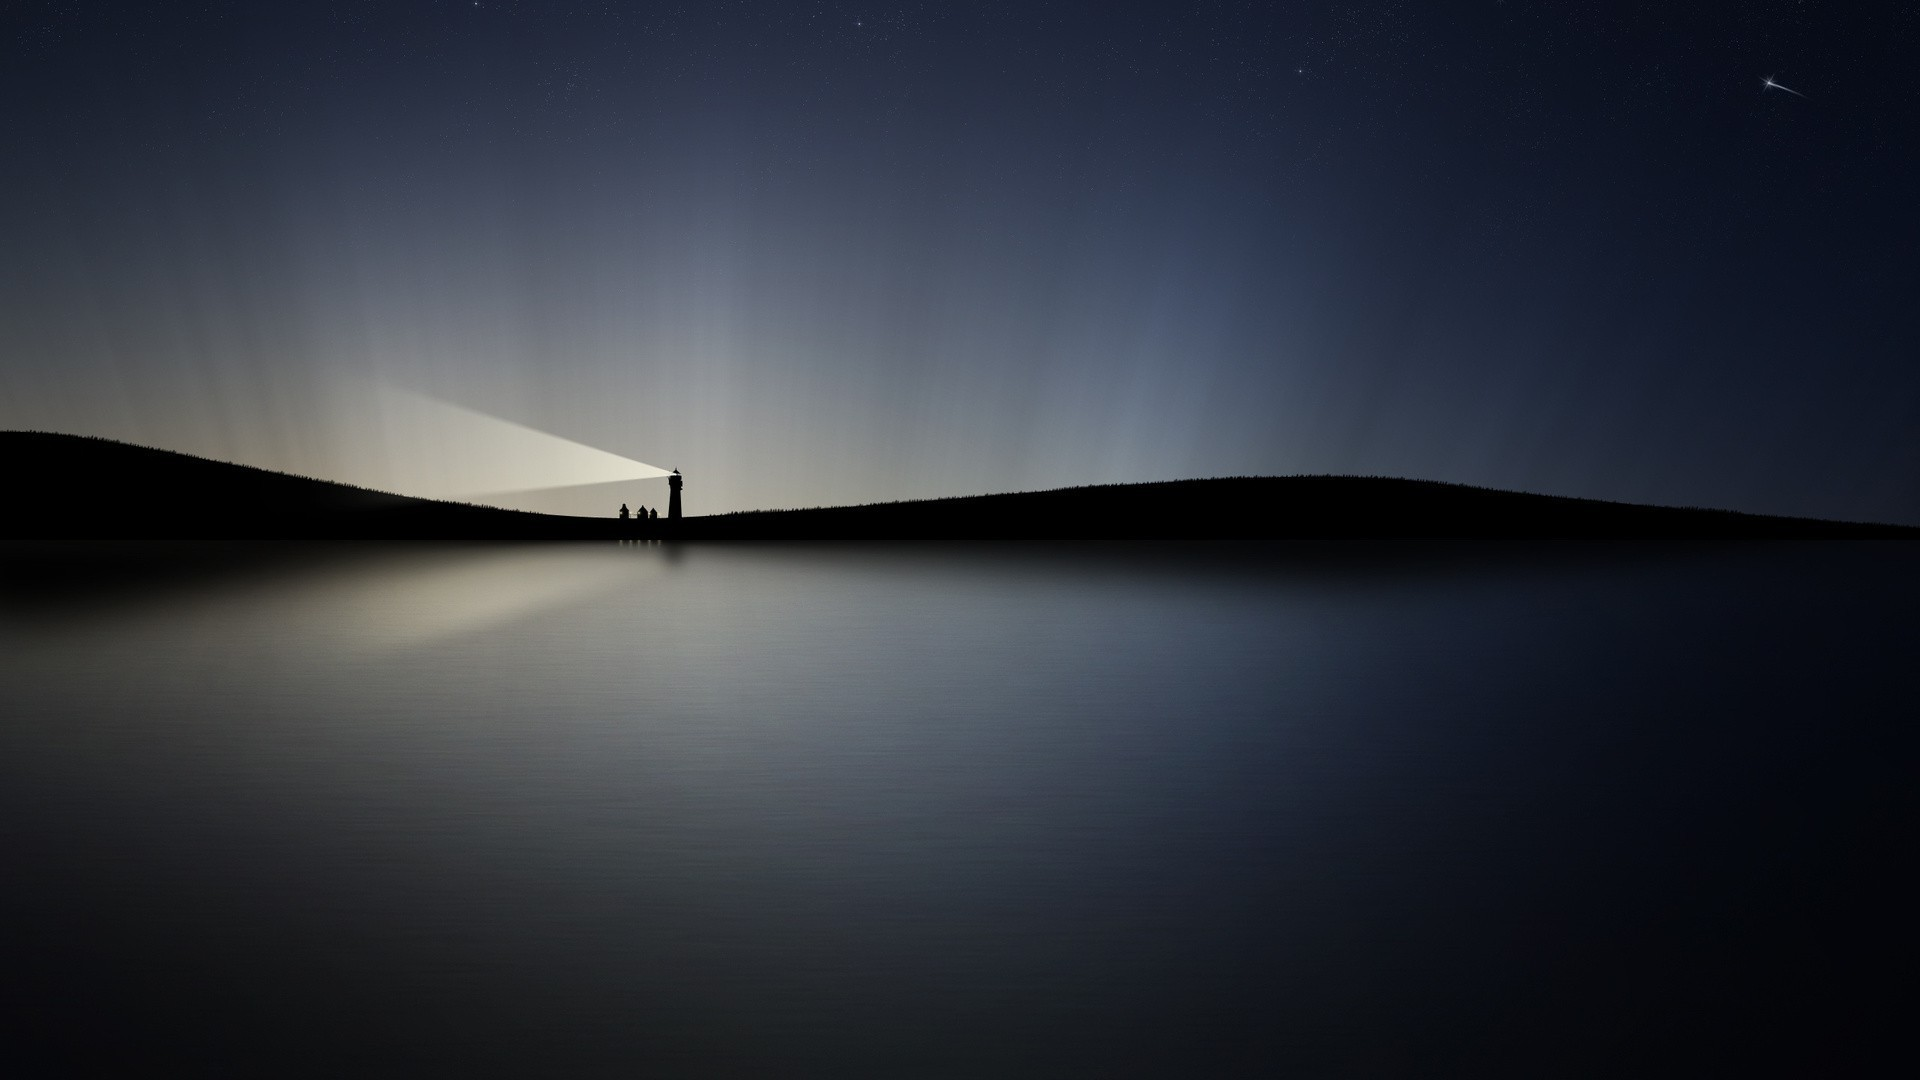 Fantastic Wallpaper Night Lighthouse - 14356470216984100855  2018-754175.jpg